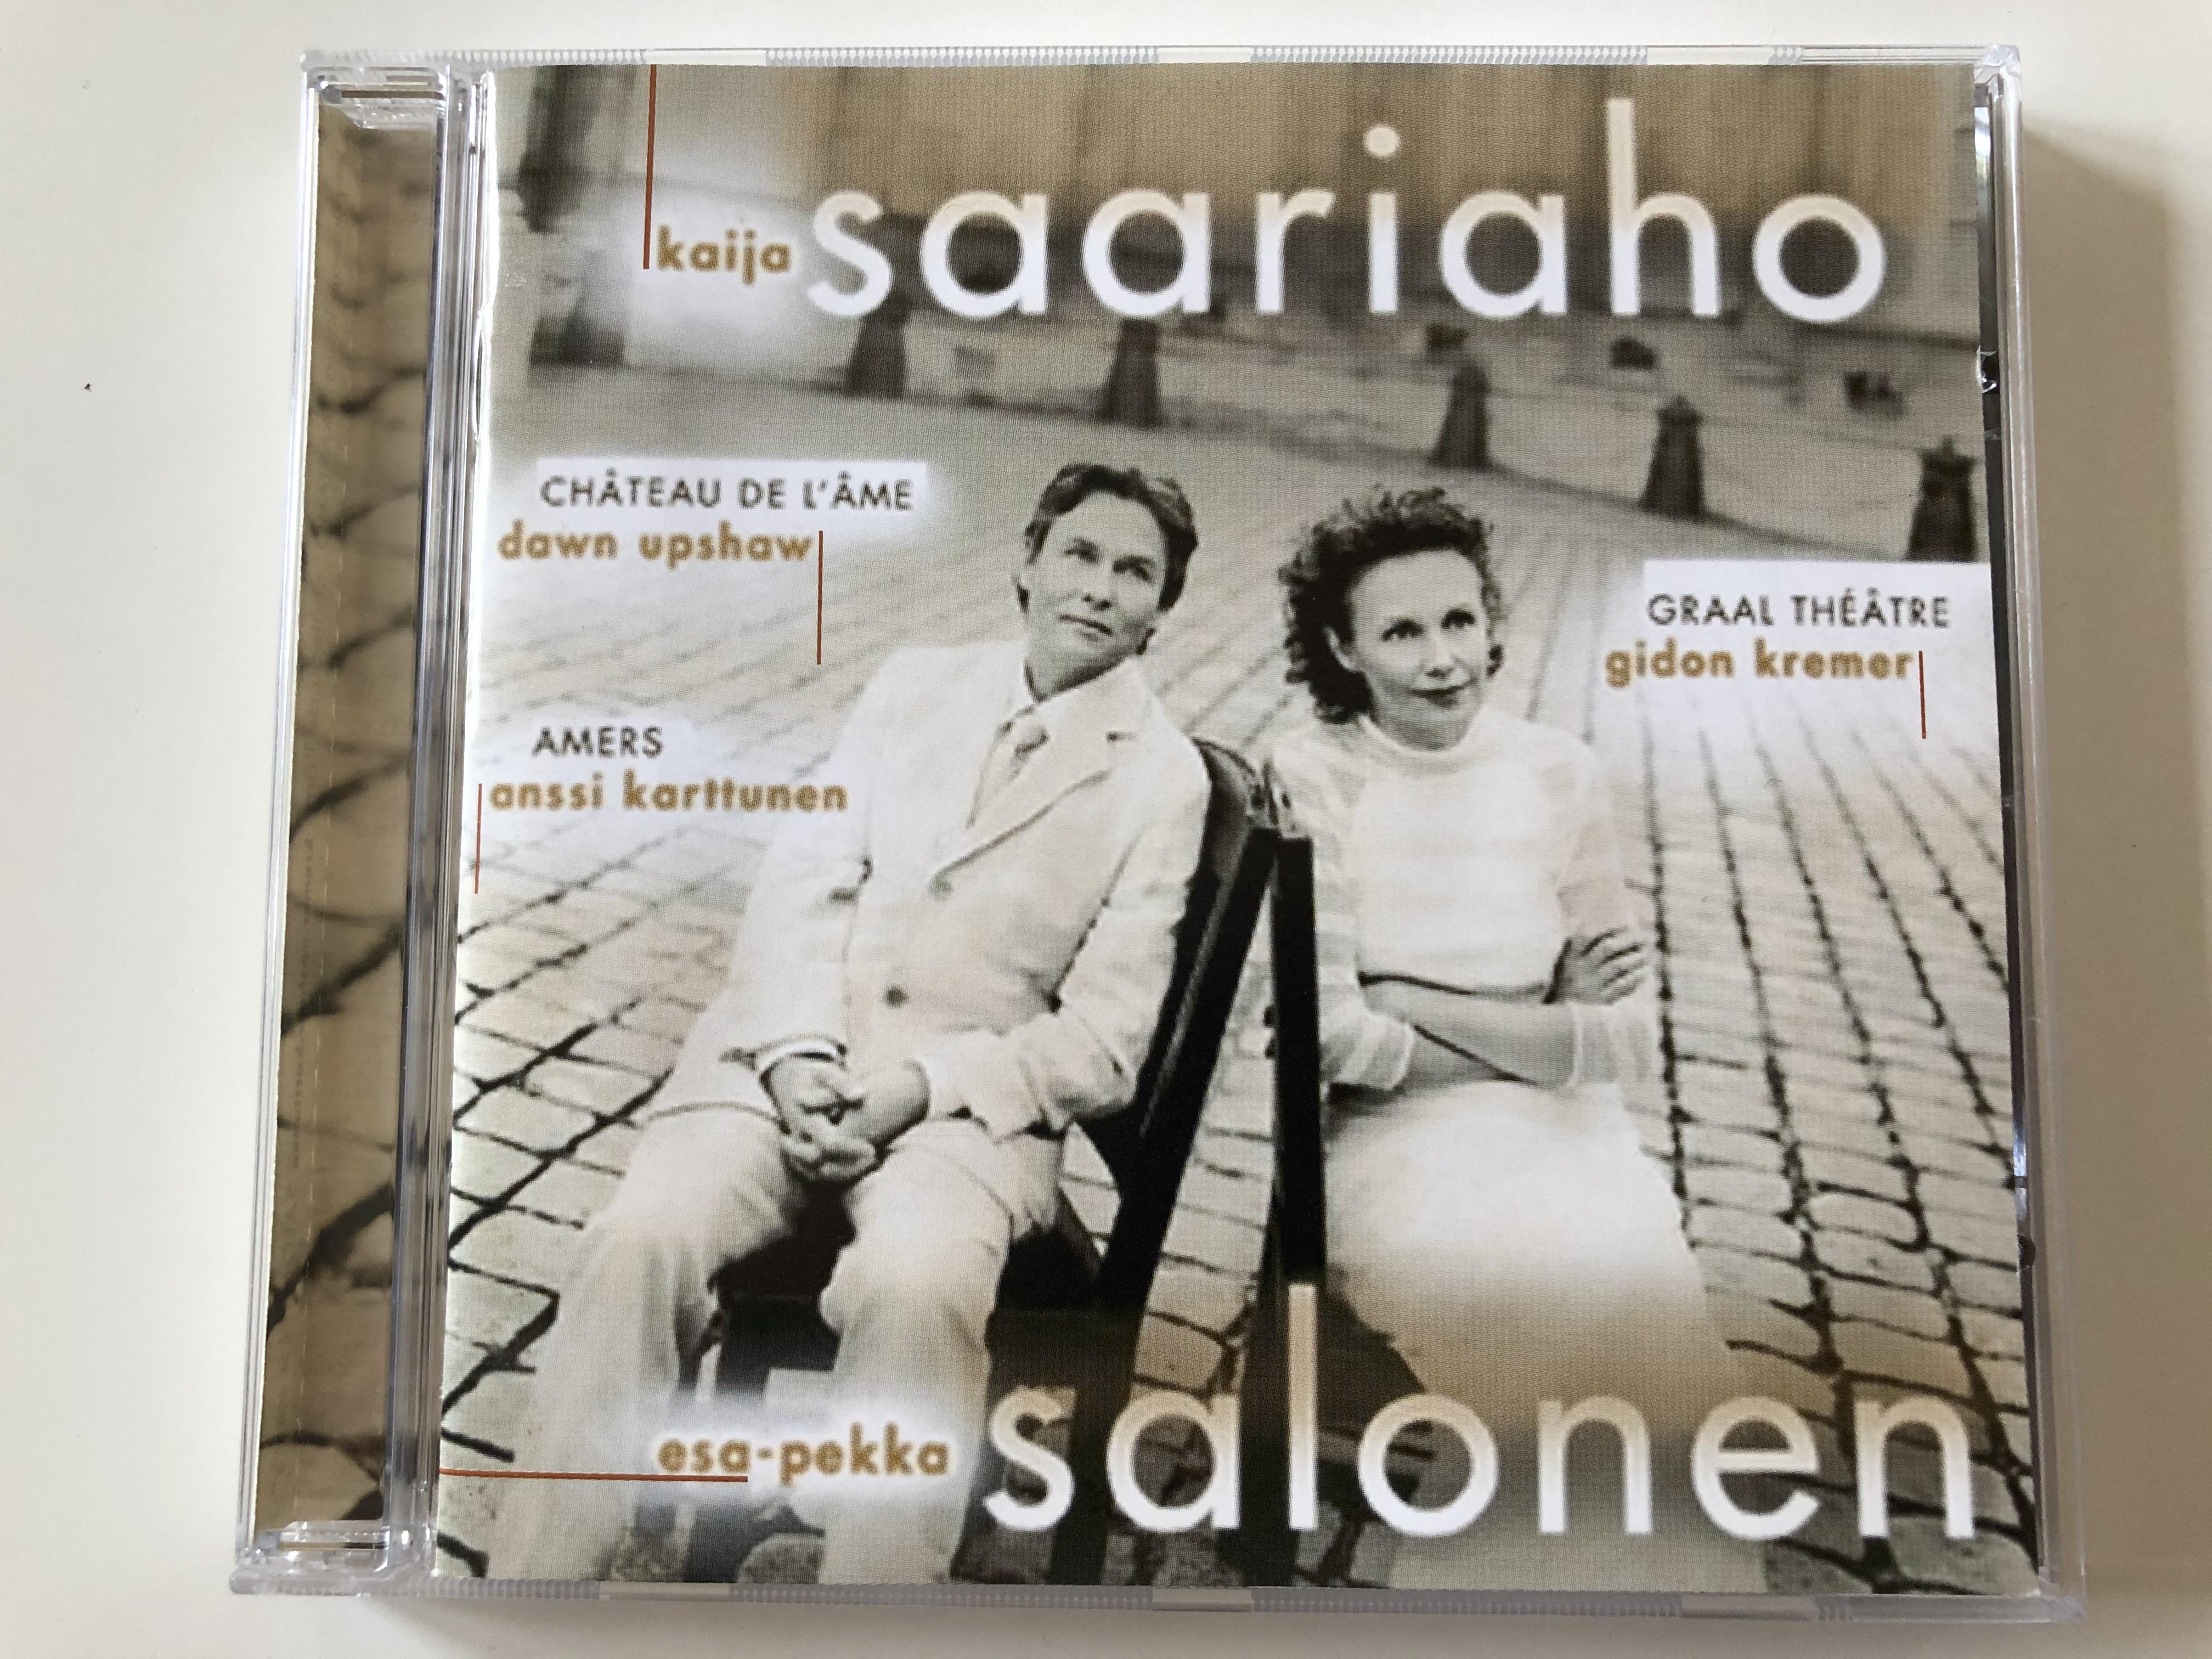 kaija-saariaho-ch-teau-de-l-me-graal-th-tre-amers-esa-pekka-salonen-sony-classical-audio-cd-2001-sk-60817-1-.jpg